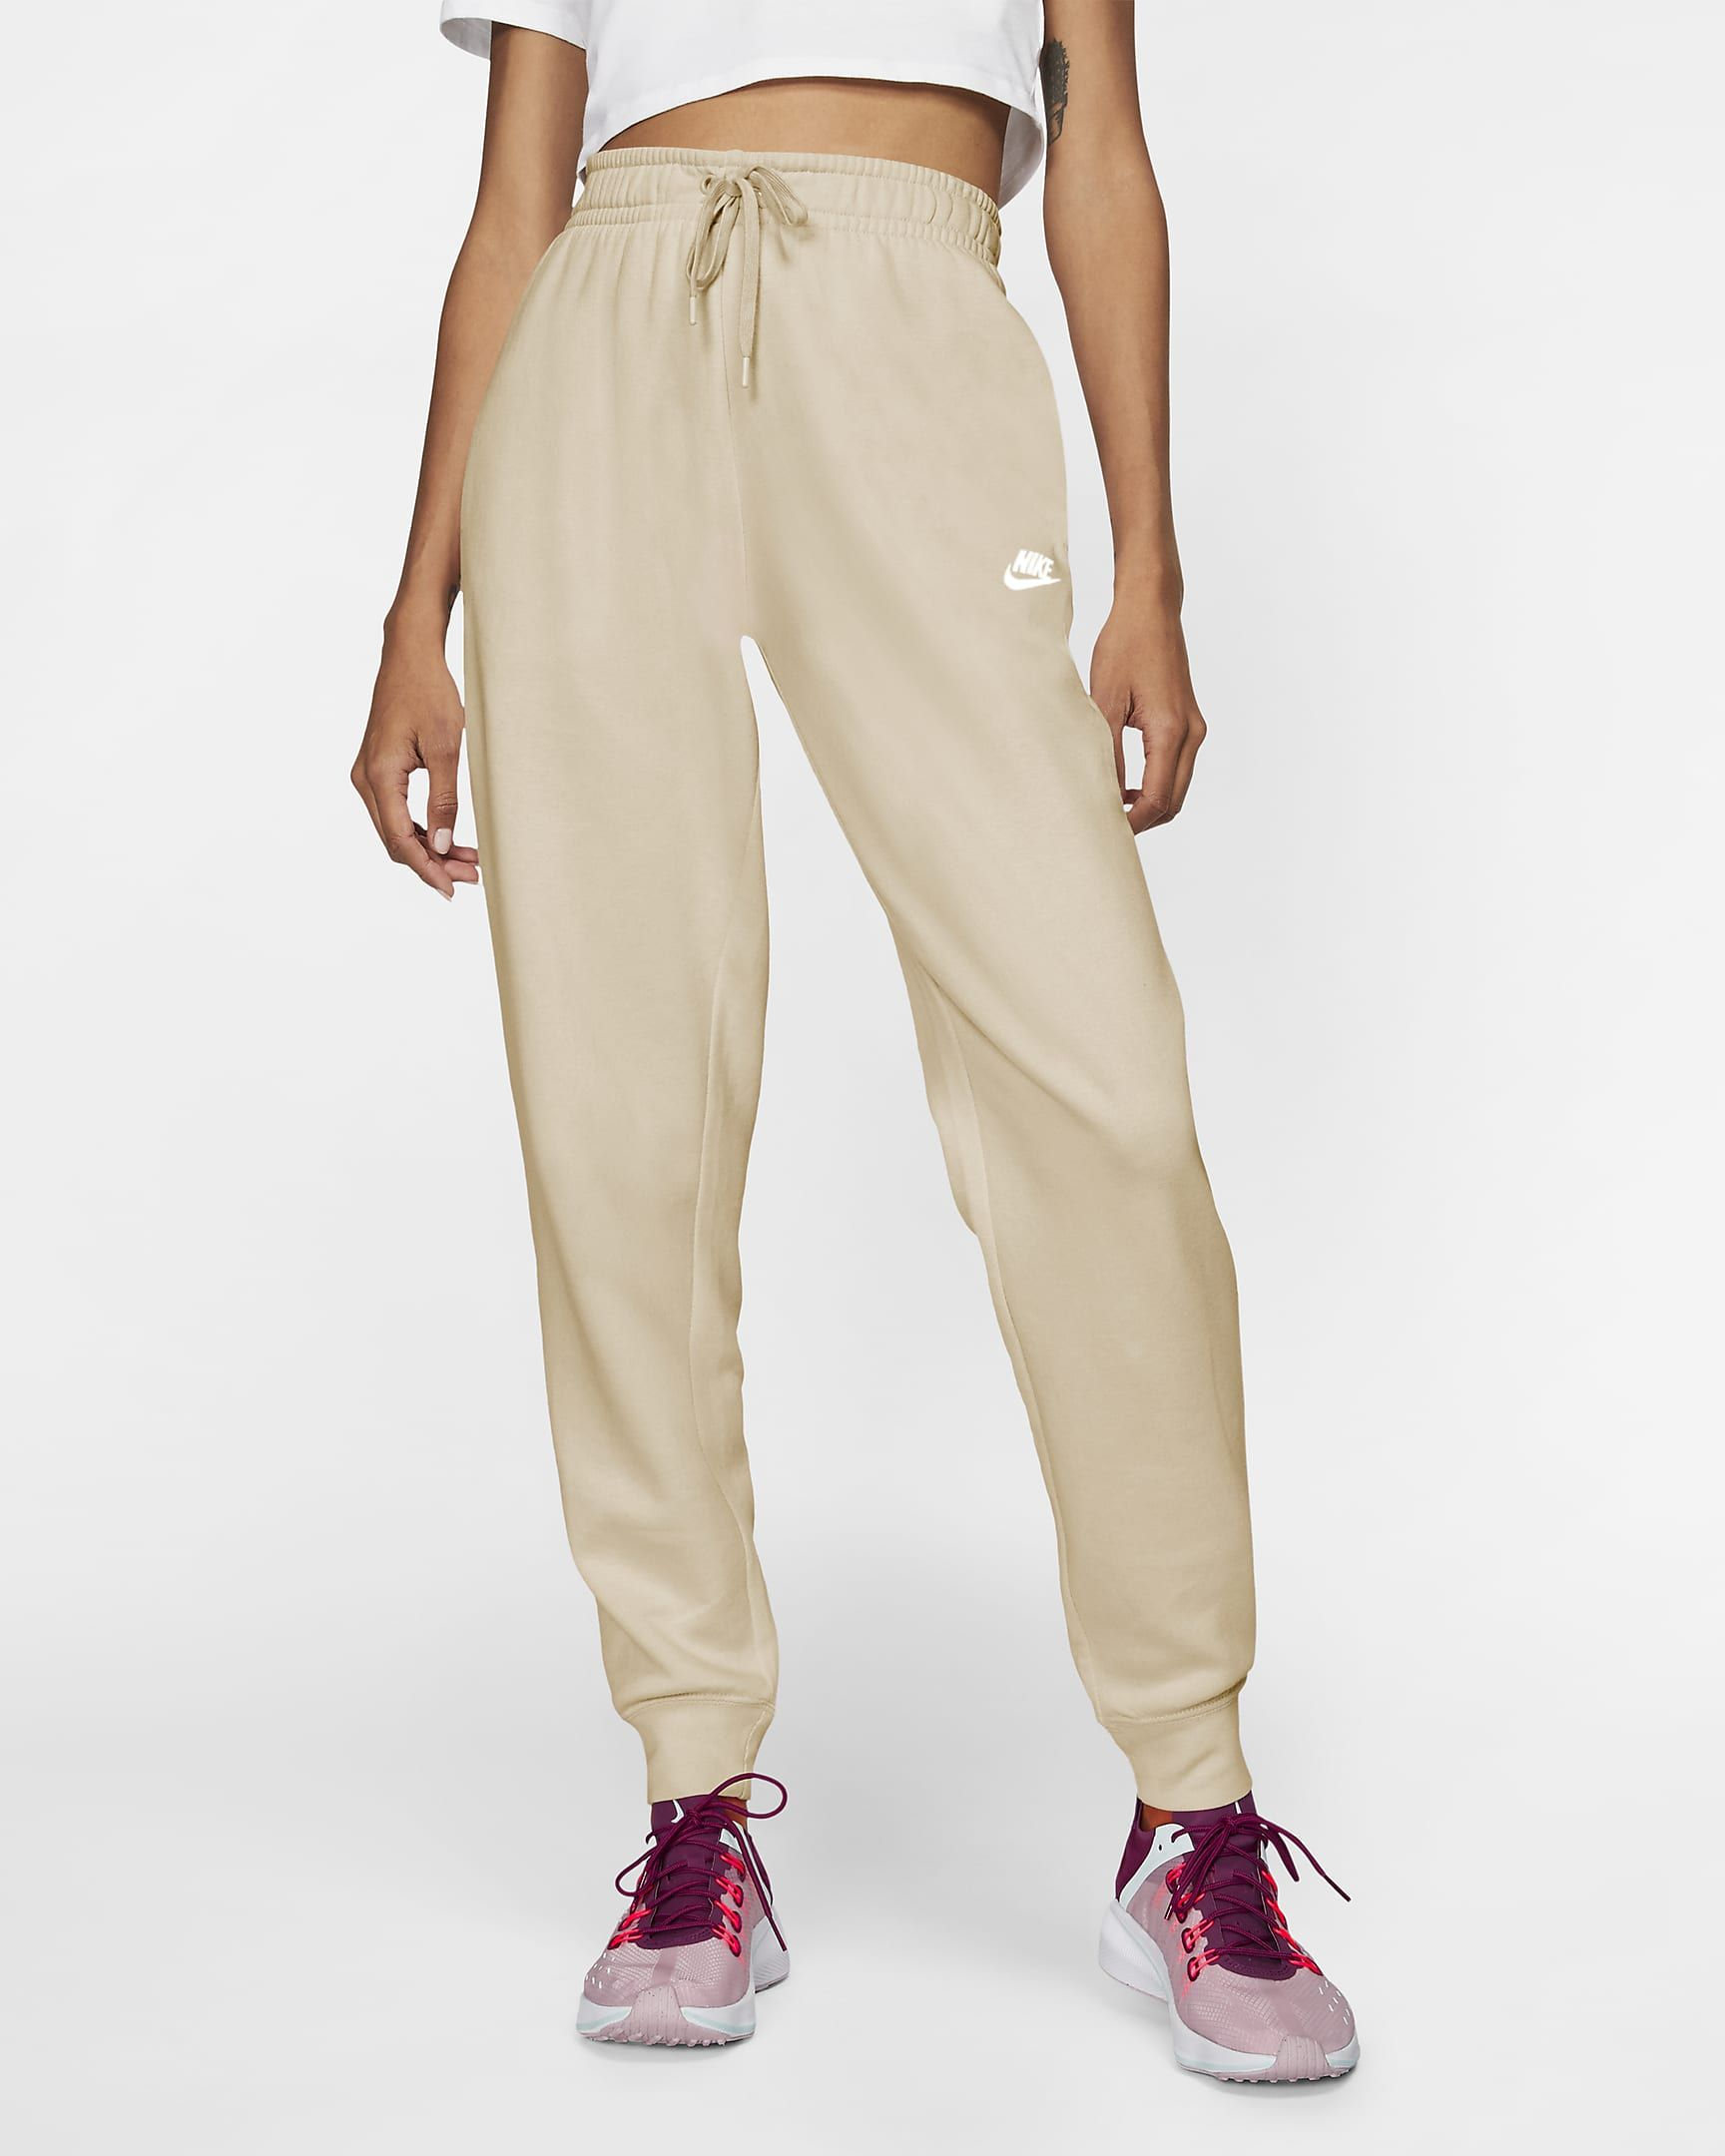 Explícito compuesto Dependencia  Nike Sportswear Women's Fleece Pants. Nike.com in 2020 | Fleece pants  women, Nike sportswear women, Womens fleece